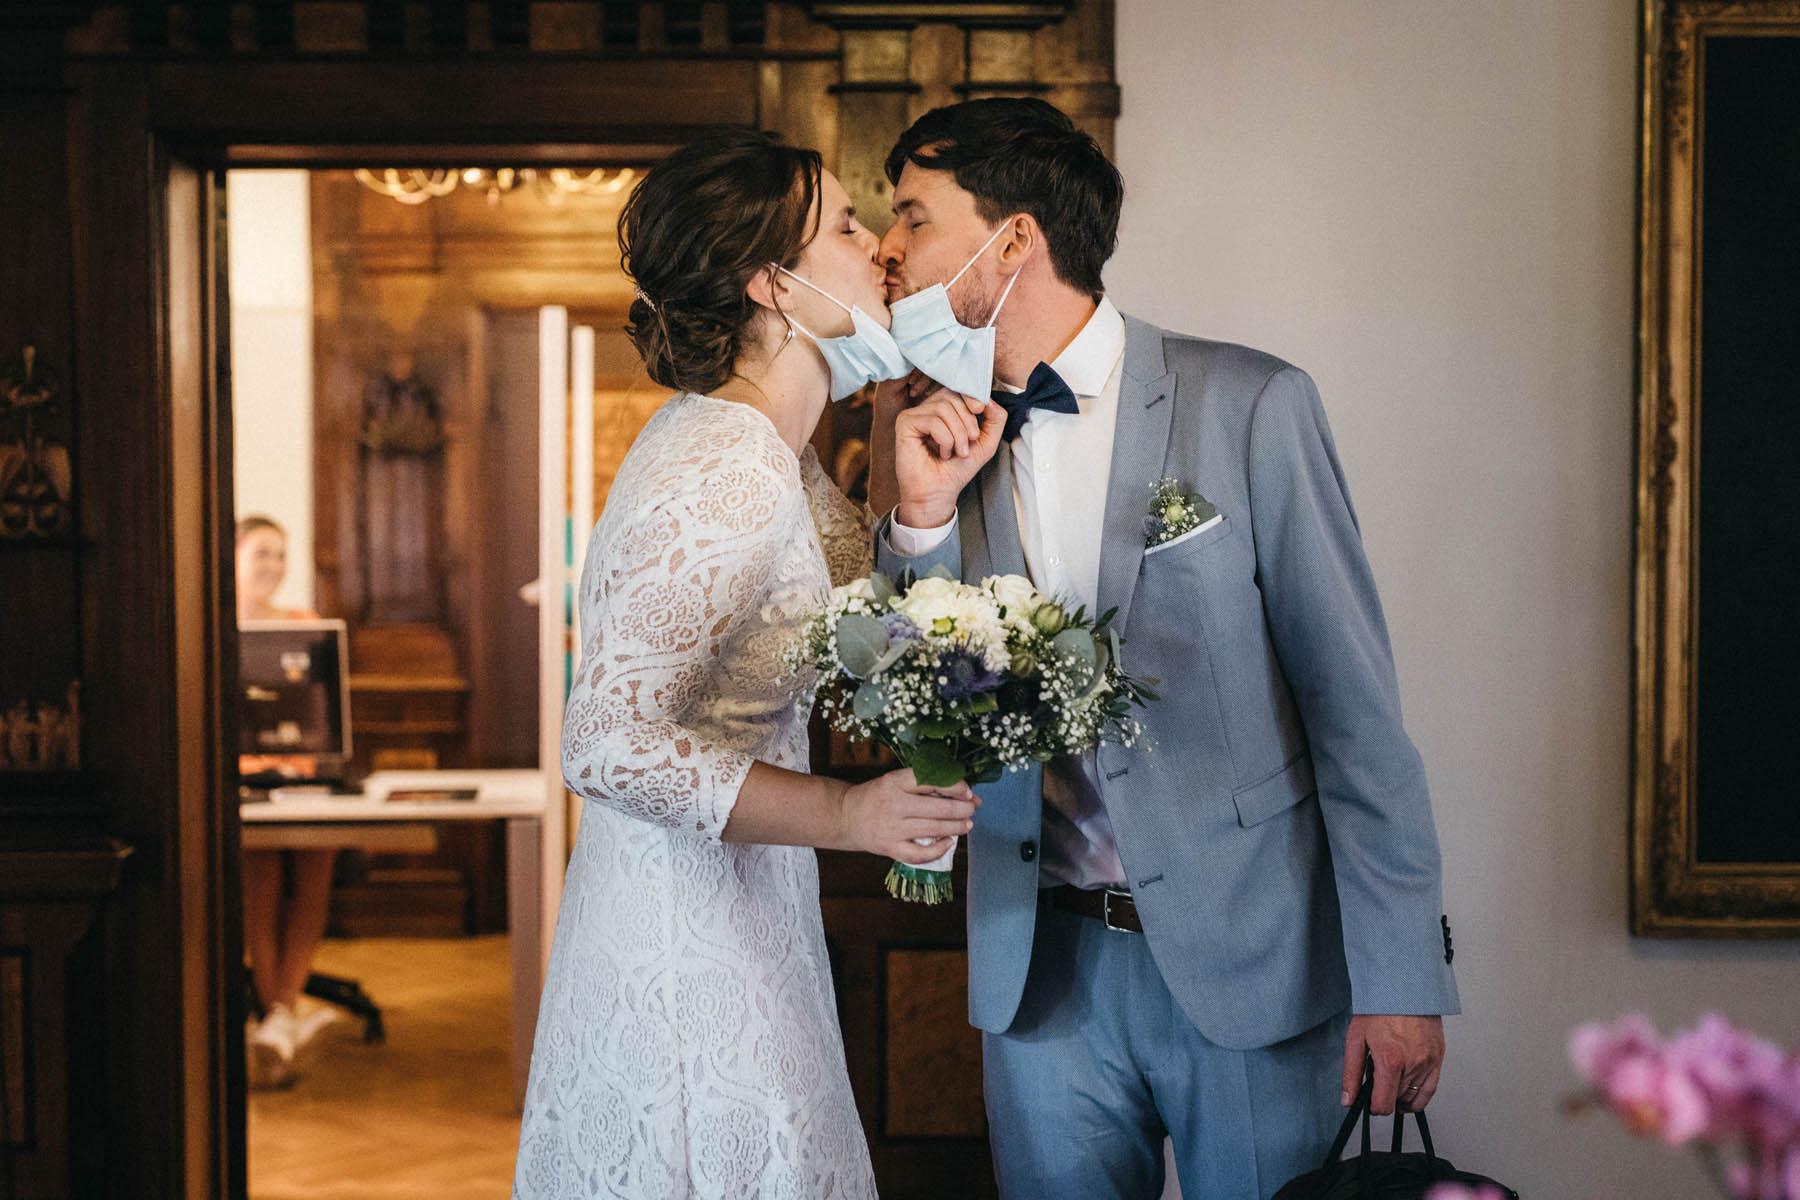 raissa simon fotografie elopement freiburg standesamt 019 - Julia + Tobias